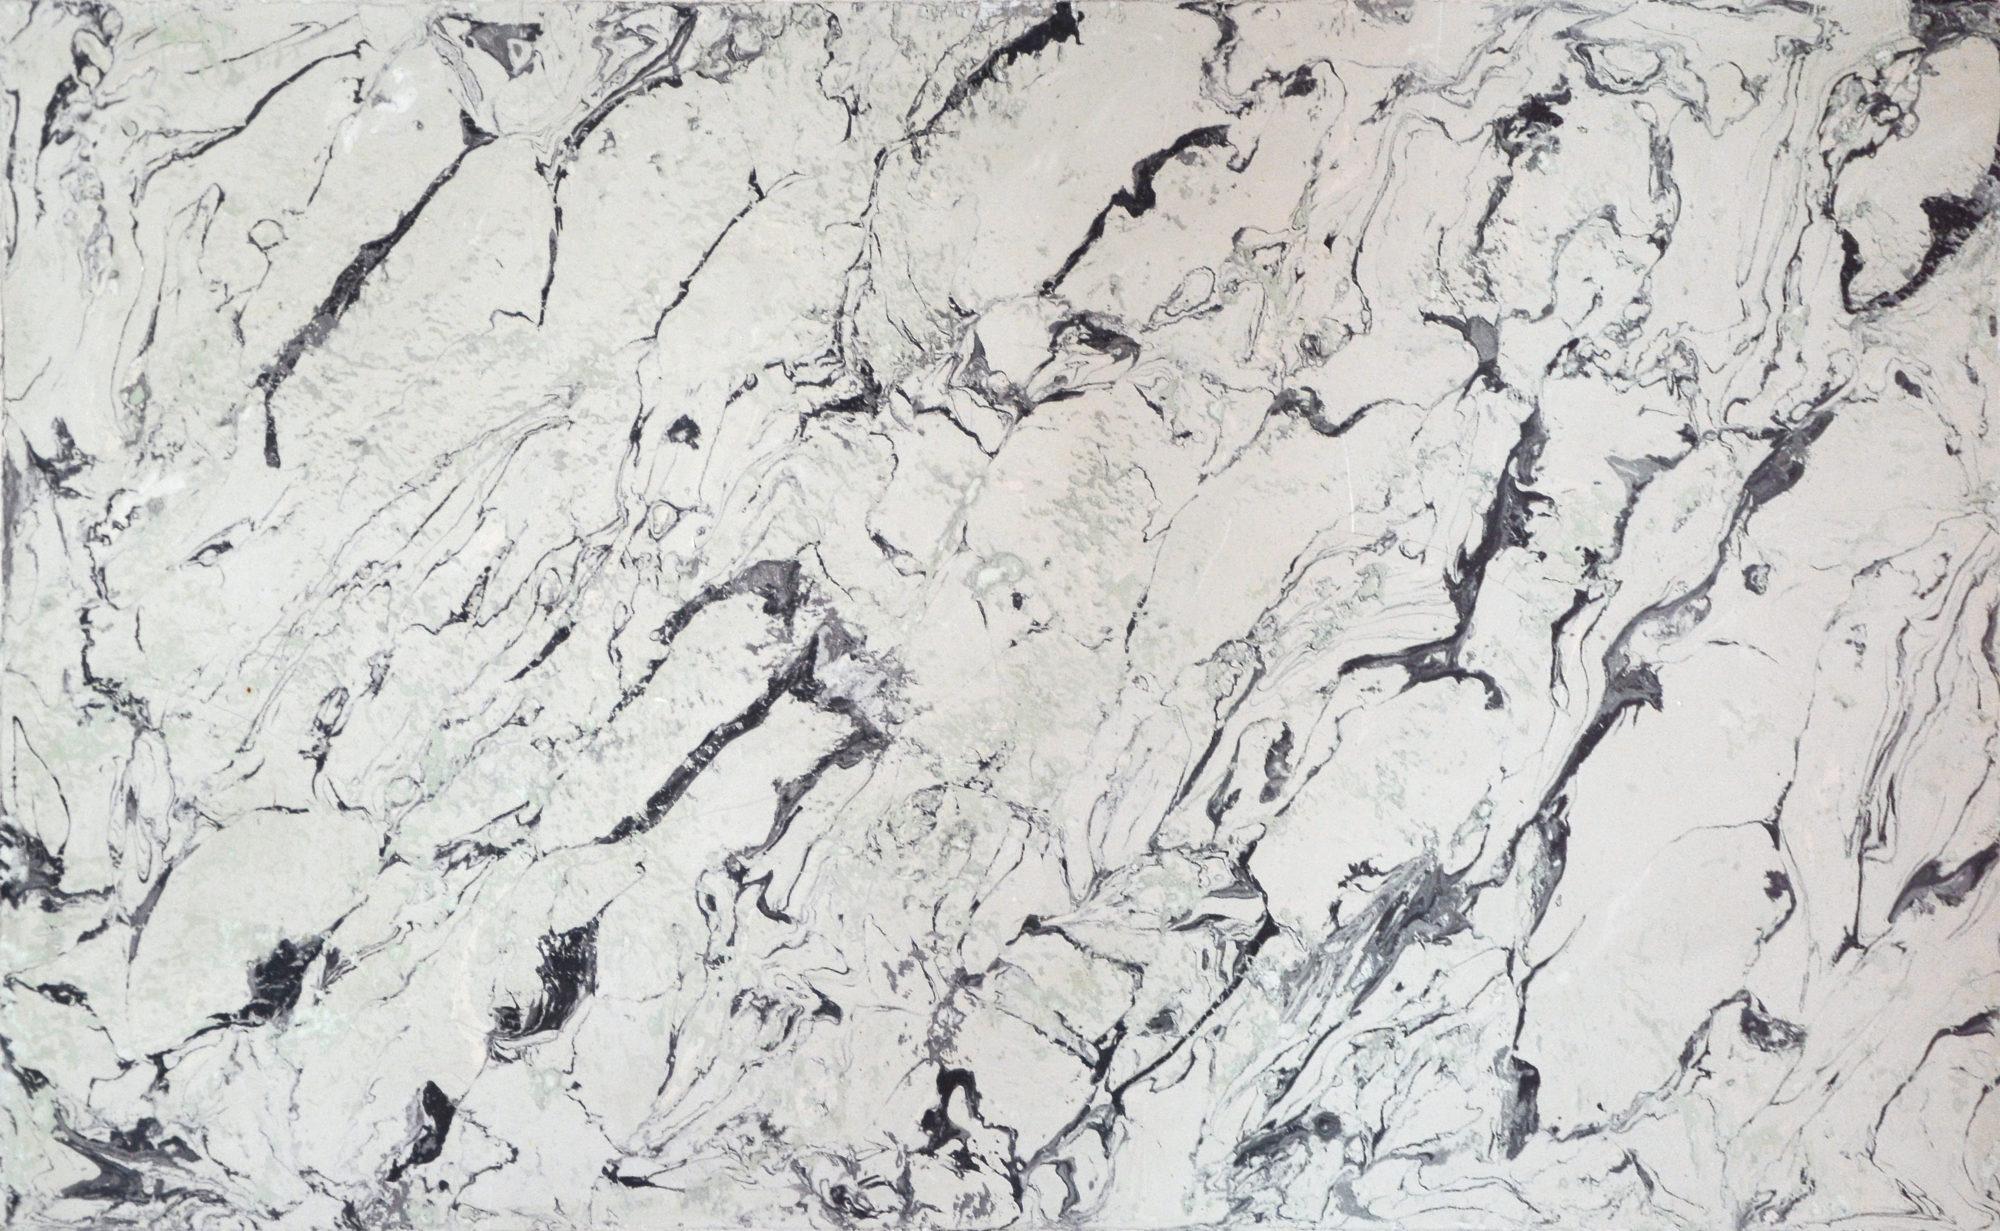 Marble_pattern_008-e1552906823324.jpg